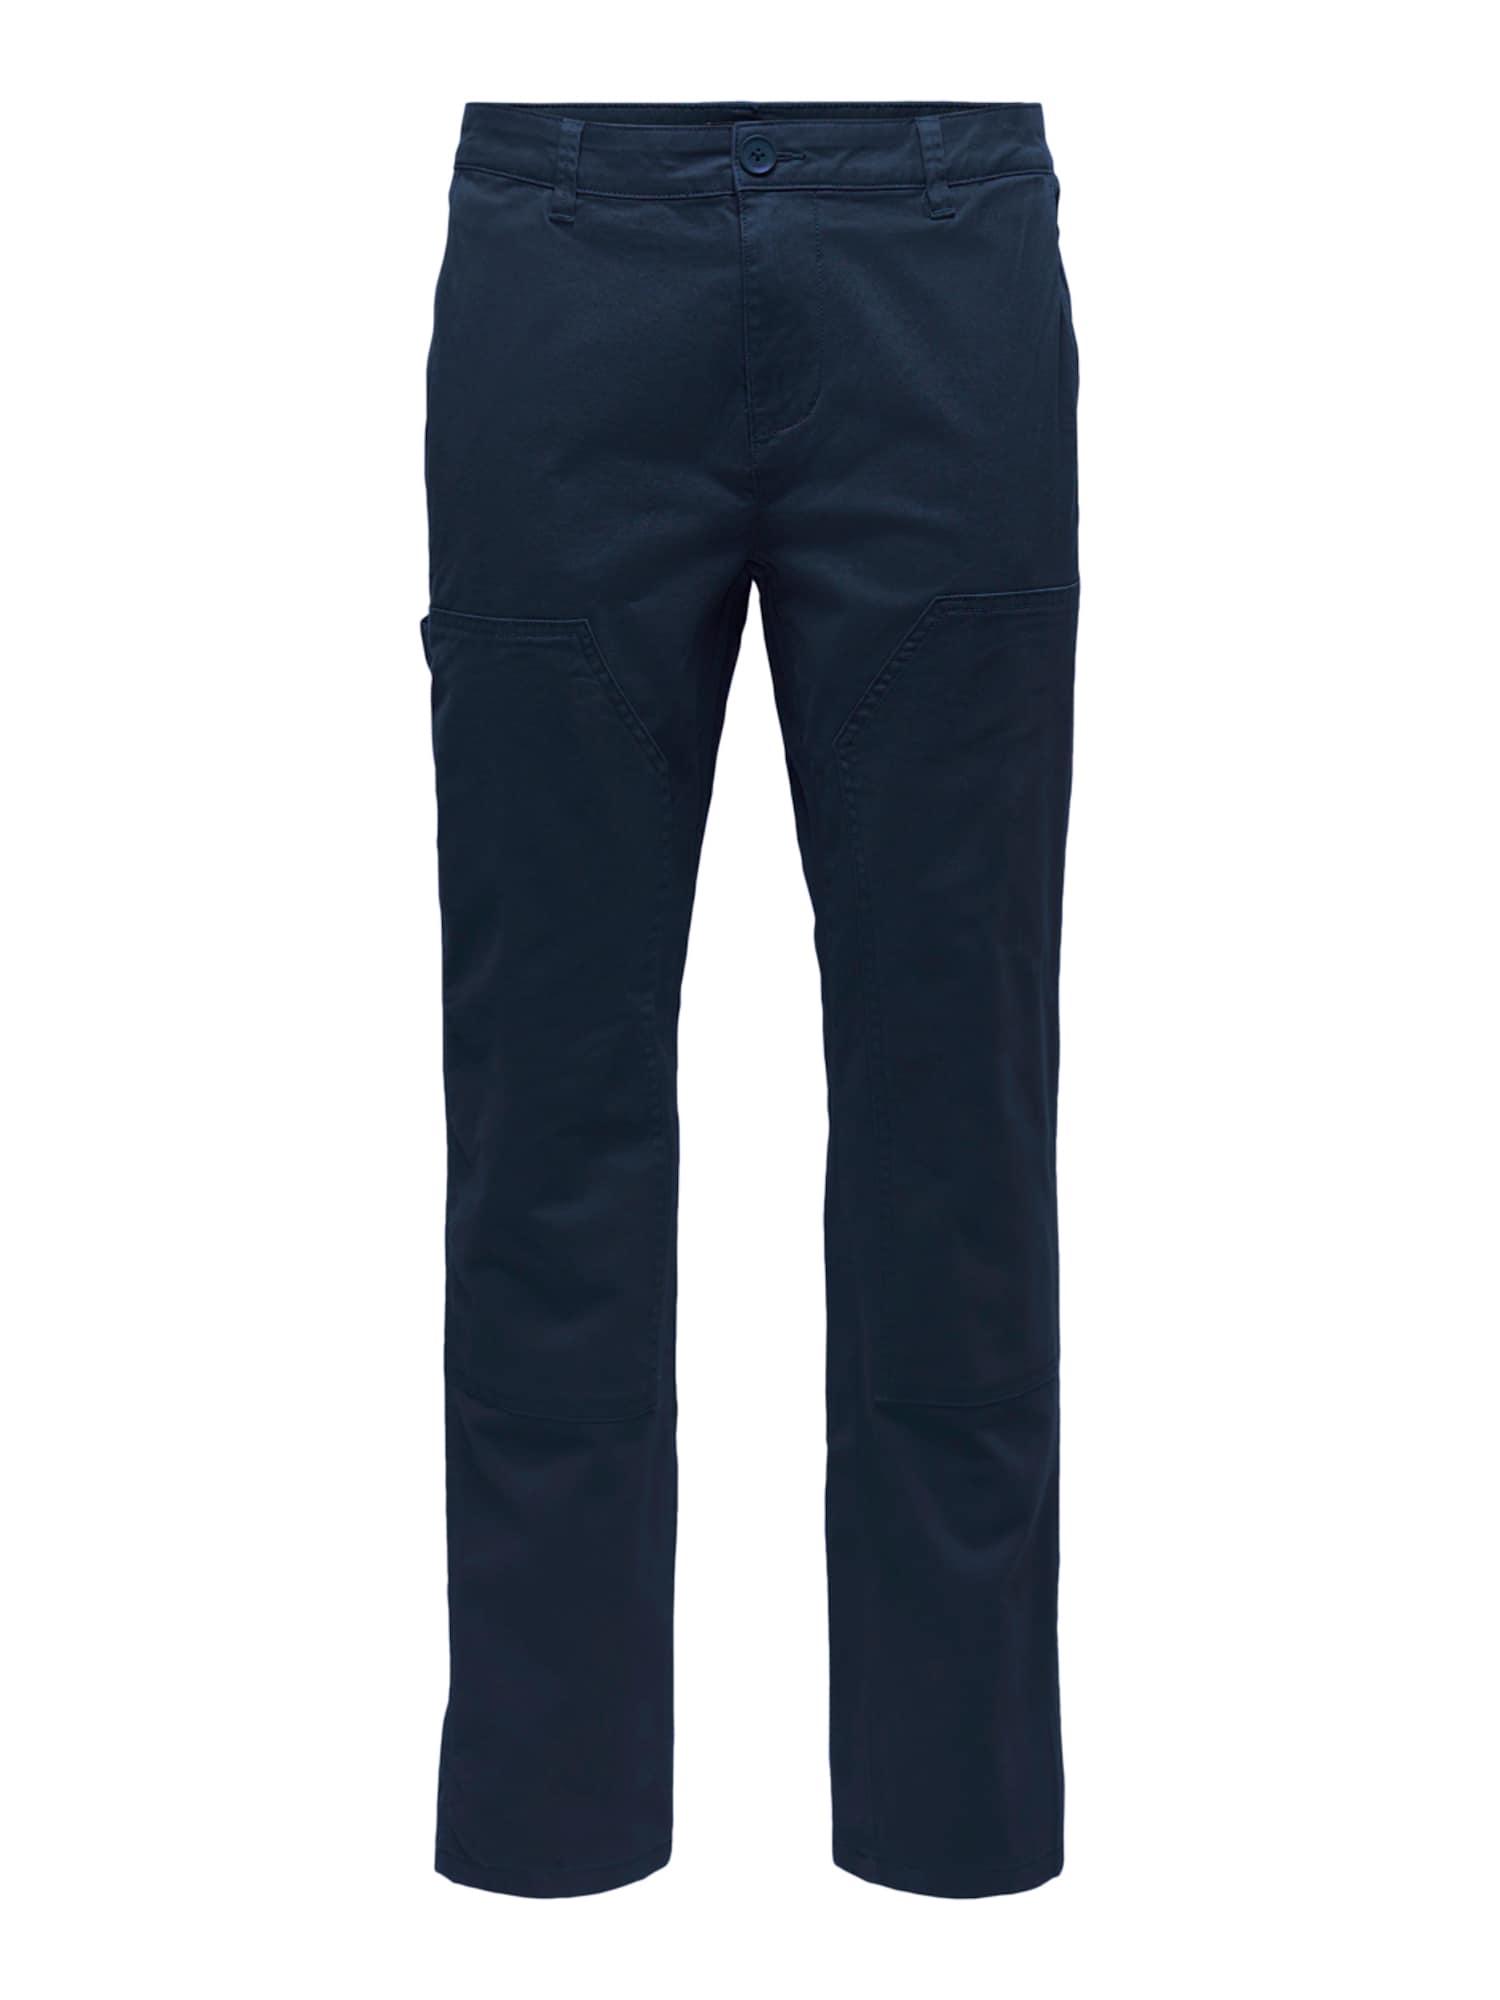 Only & Sons Pantalon 'Cam'  - Bleu - Taille: 33 - male